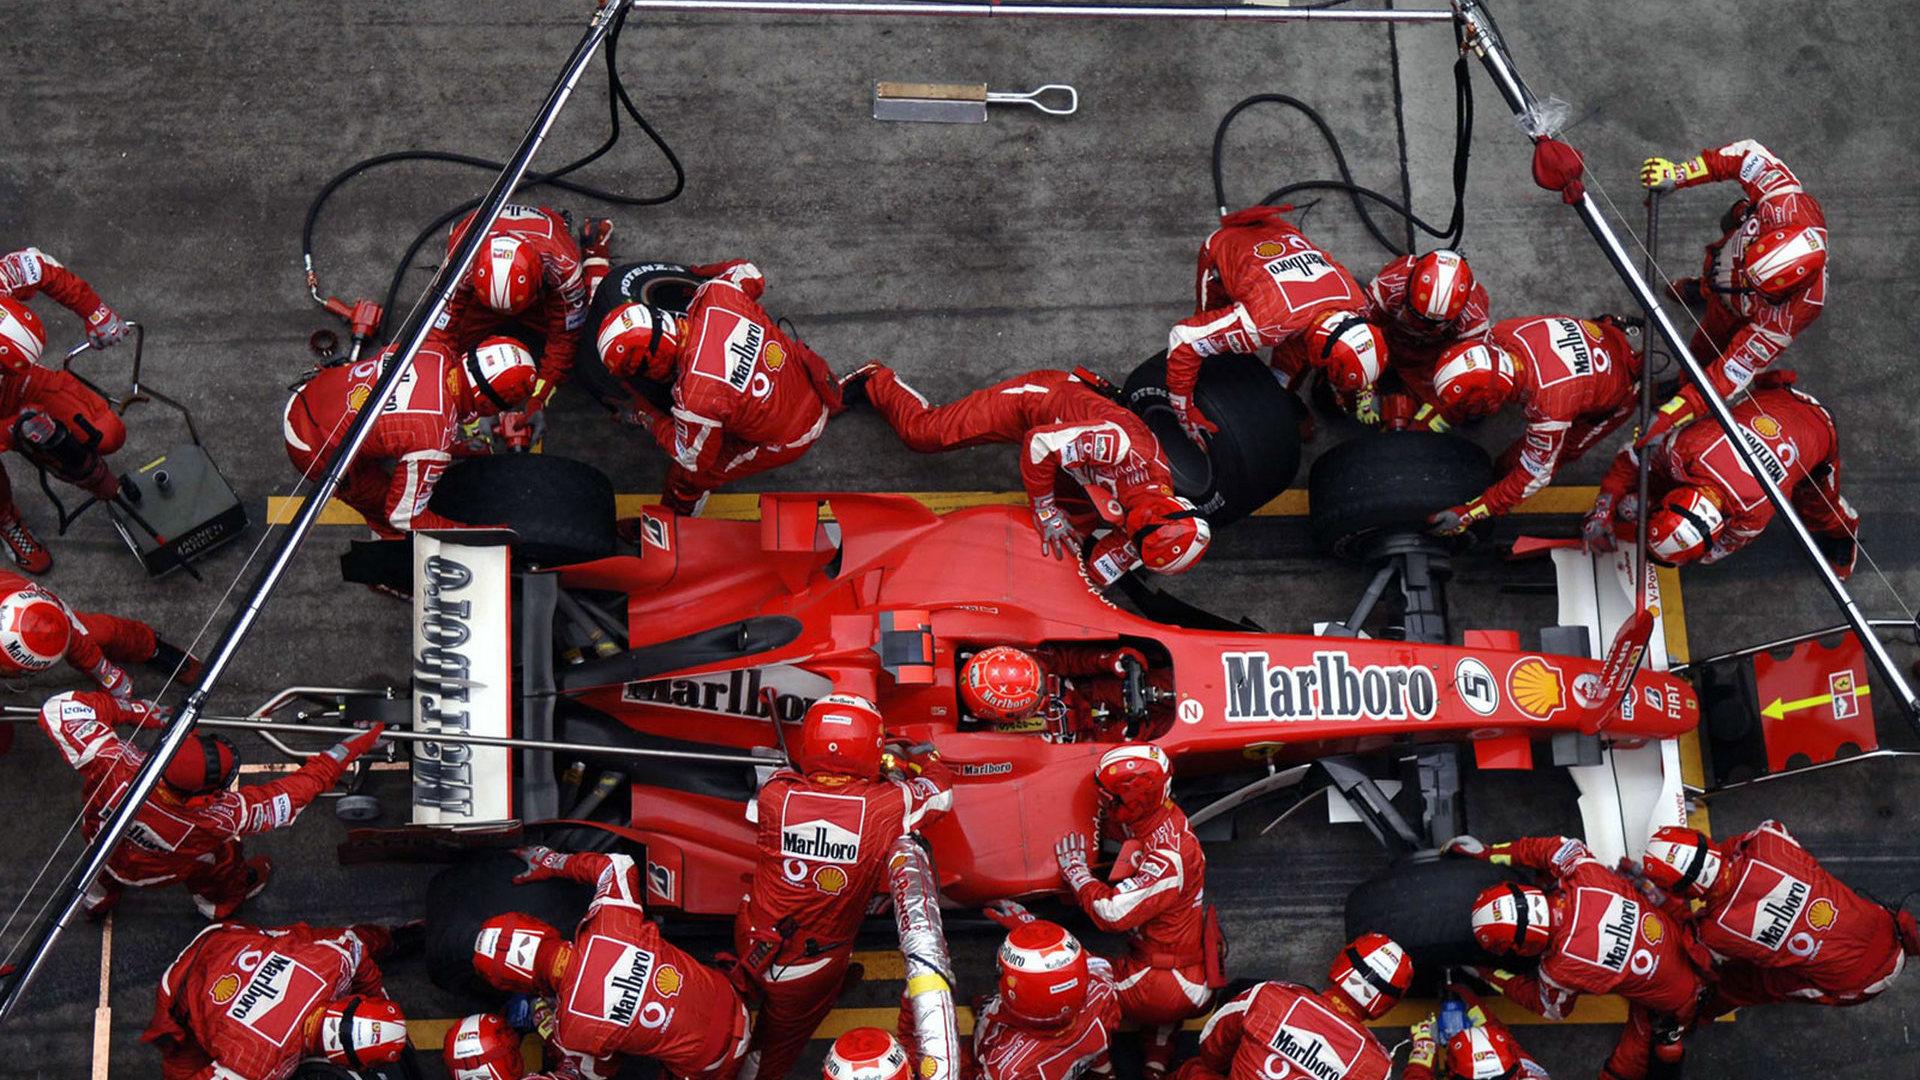 williams formula 1 drivers